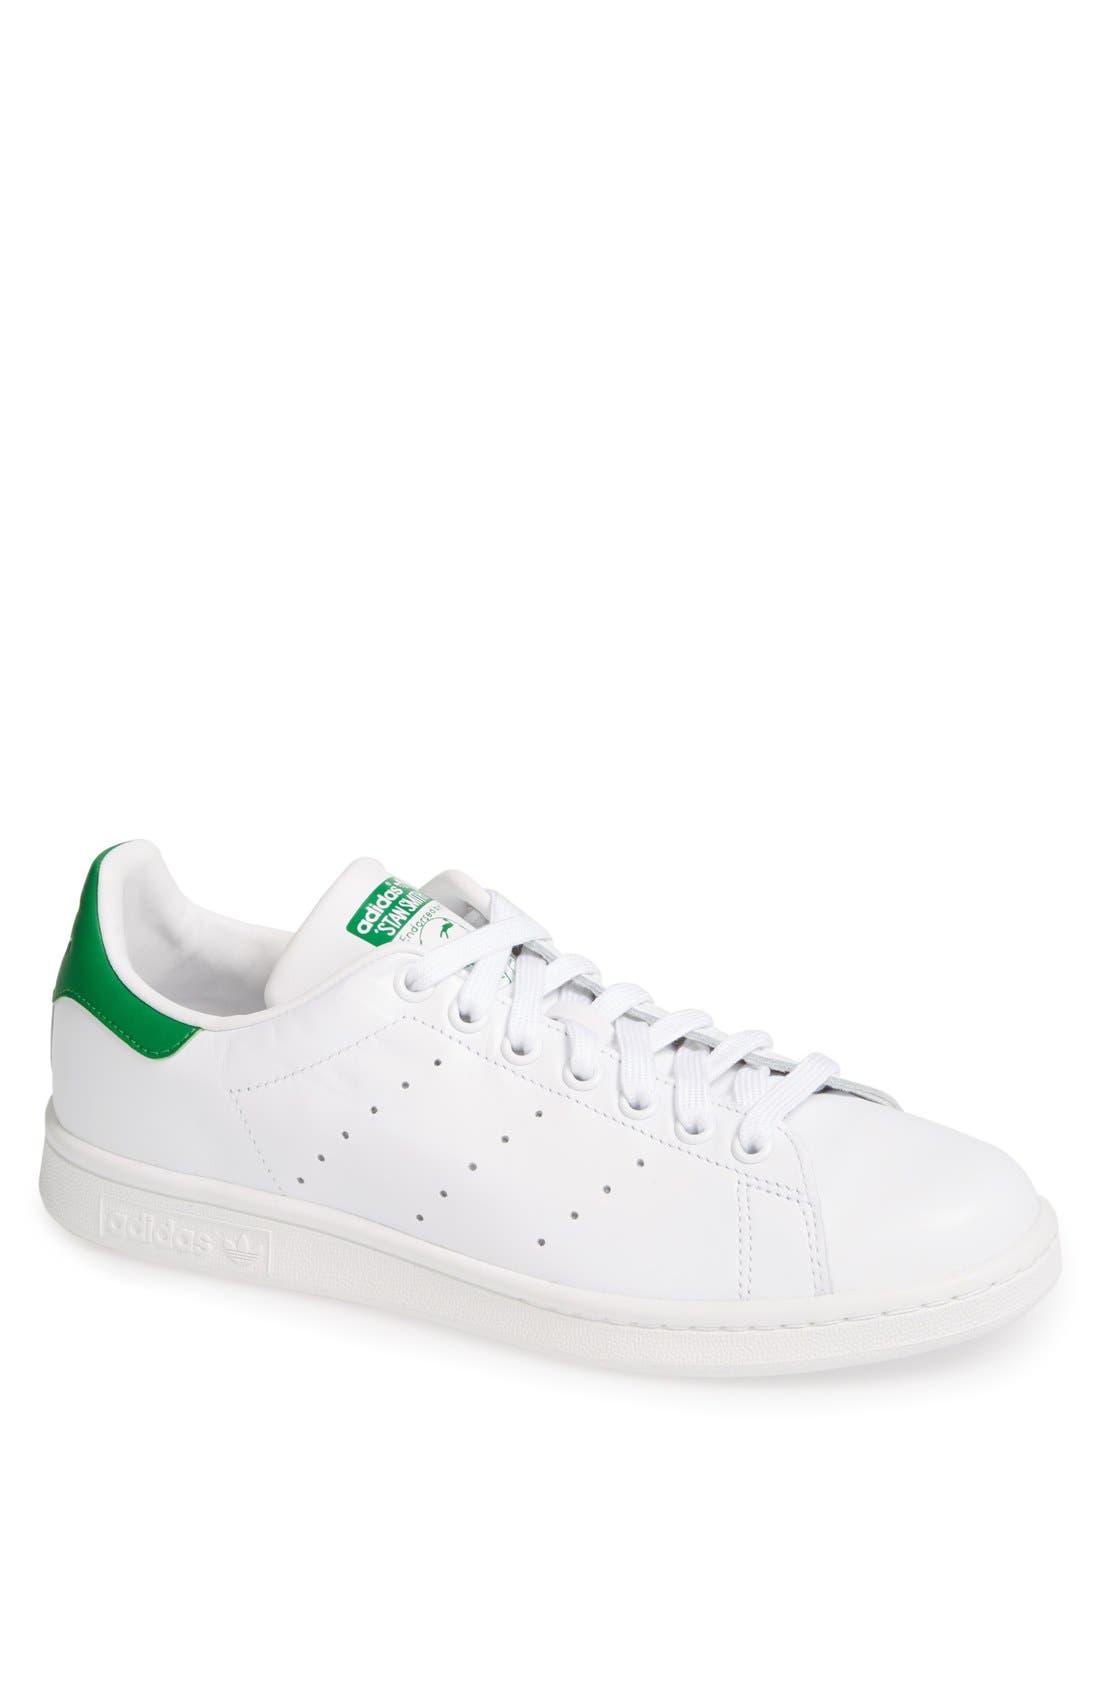 Main Image - adidas \u0027Stan Smith\u0027 Sneaker (Women)